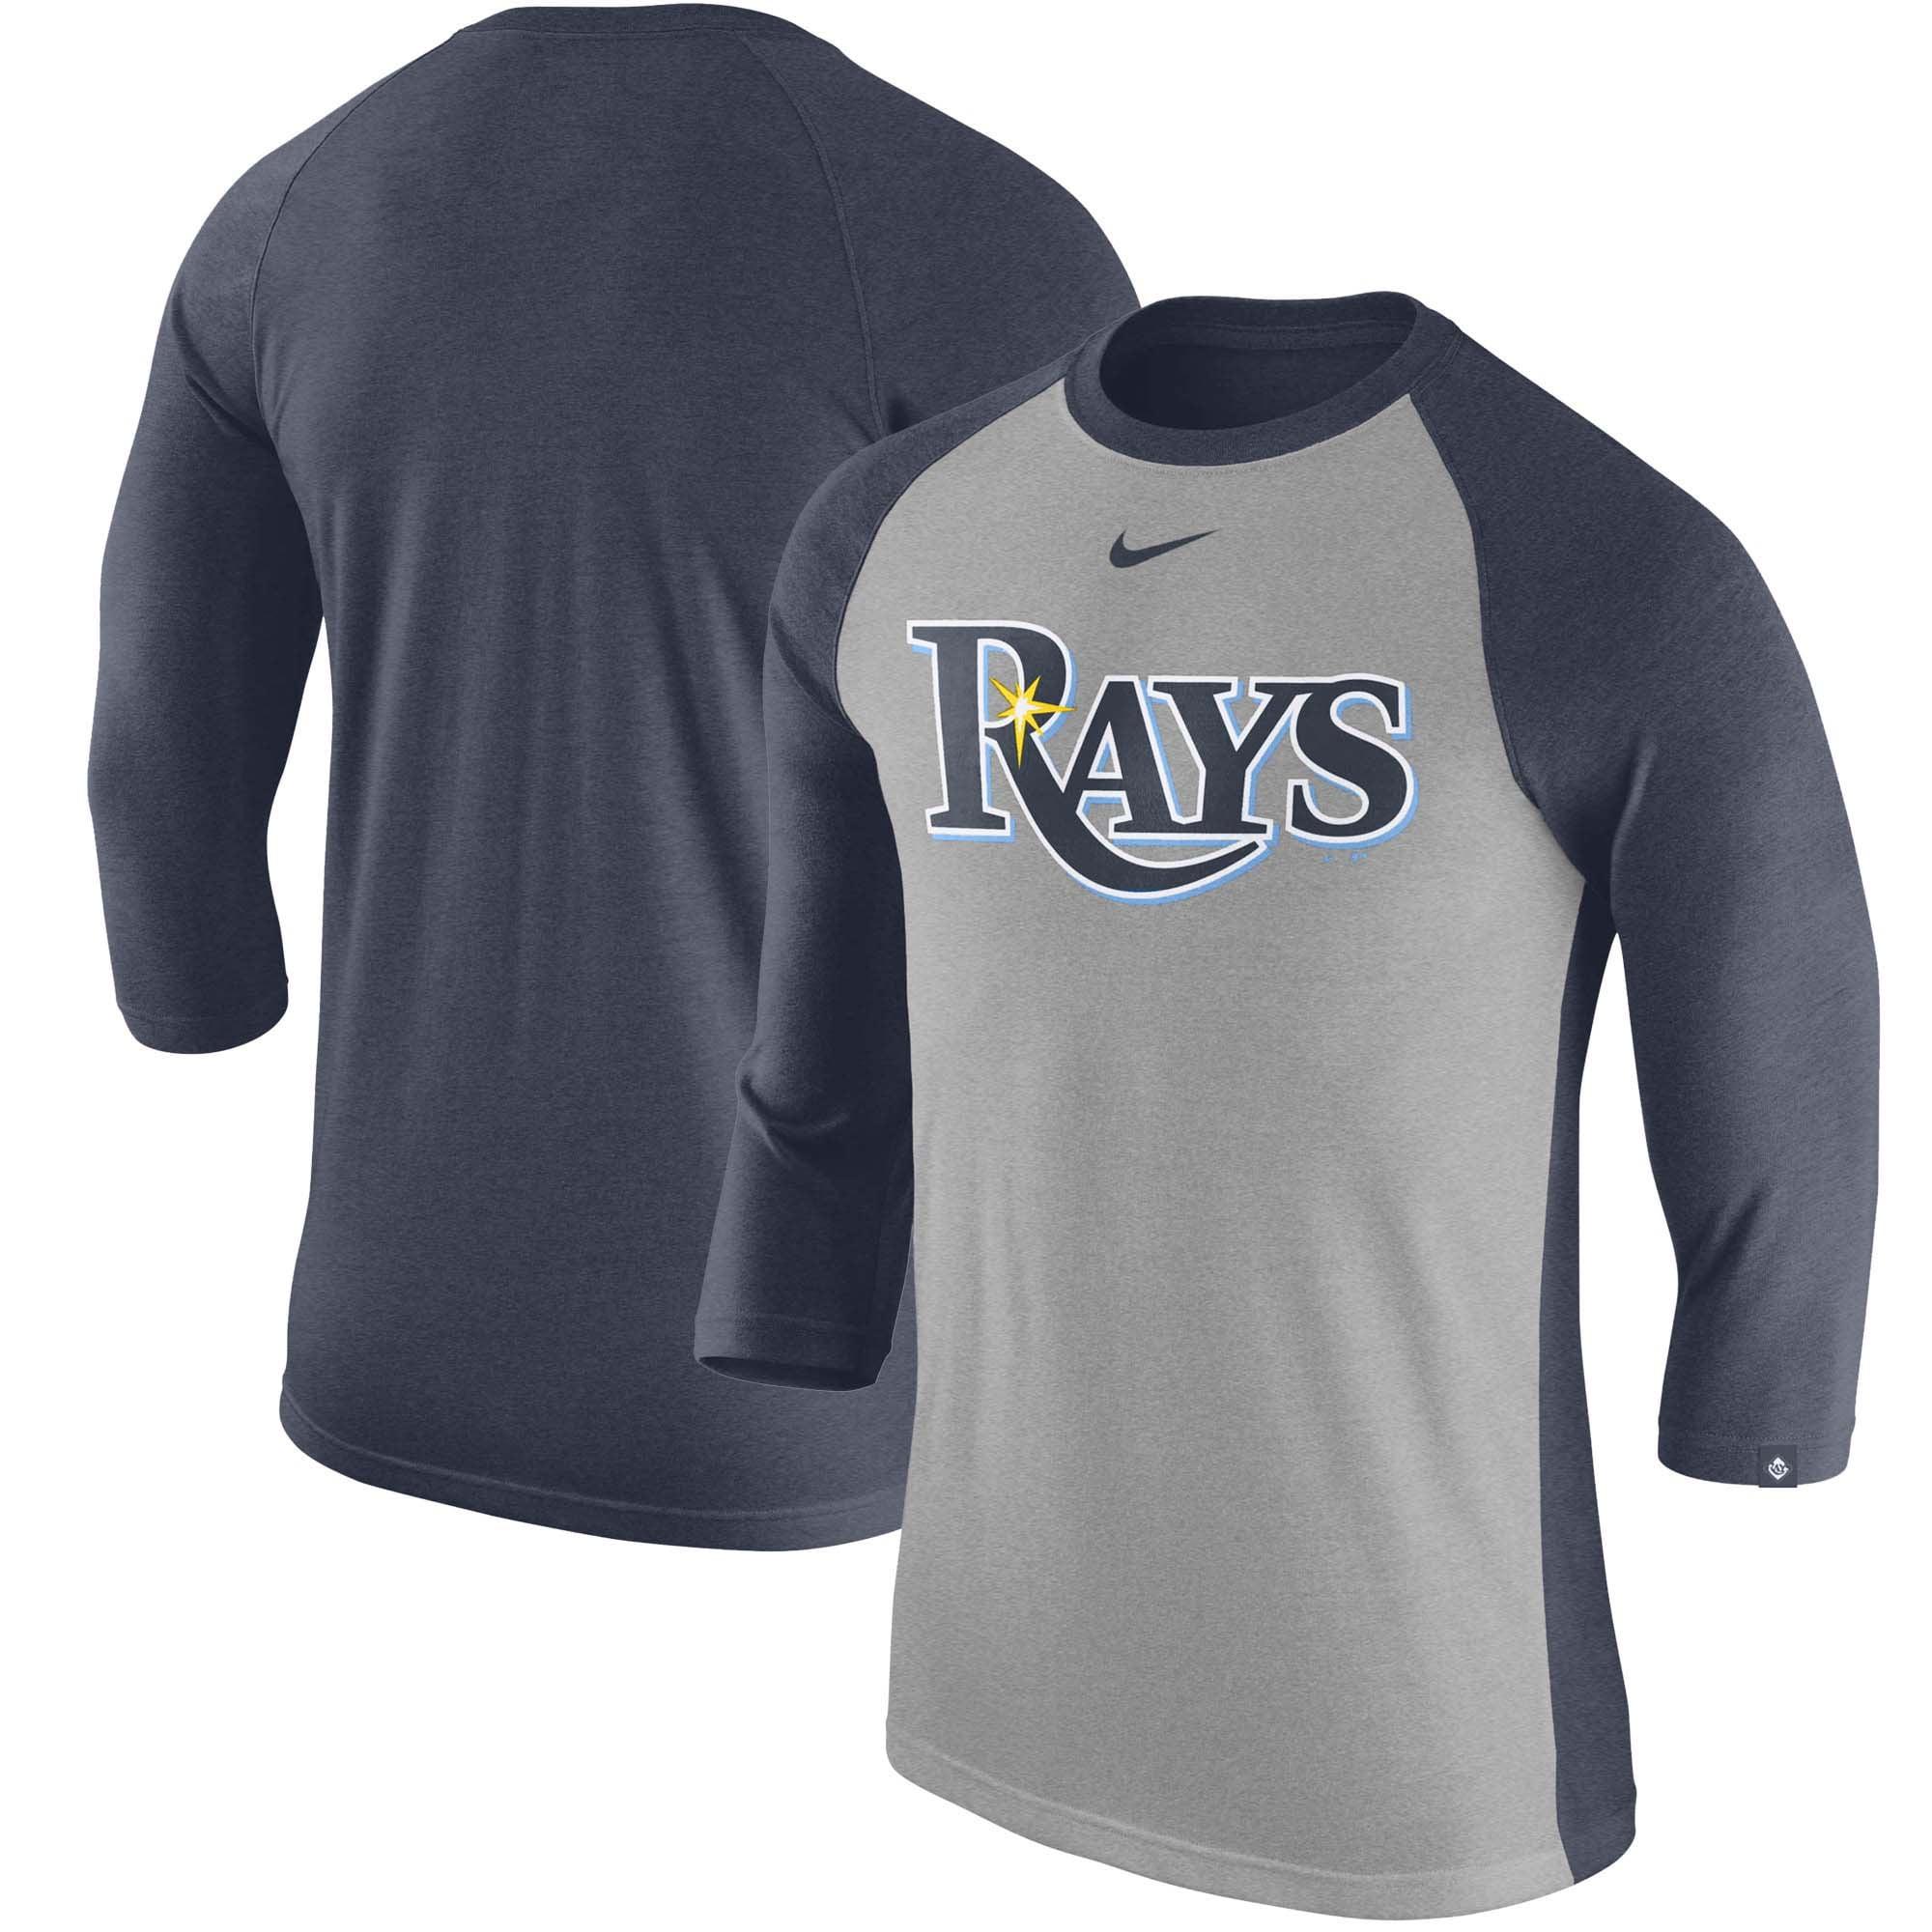 Tampa Bay Rays Nike Wordmark Tri-Blend Raglan 3/4-Sleeve T-Shirt - Gray/Navy